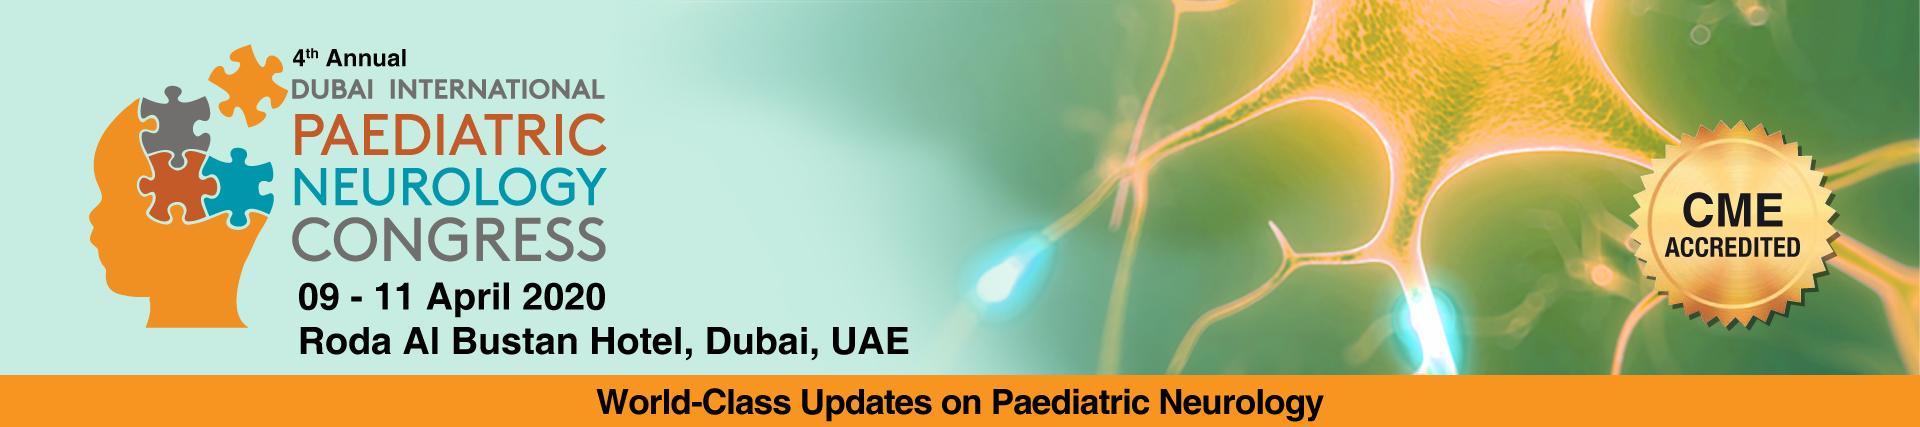 Dubai International Paediatric Neurology Congress